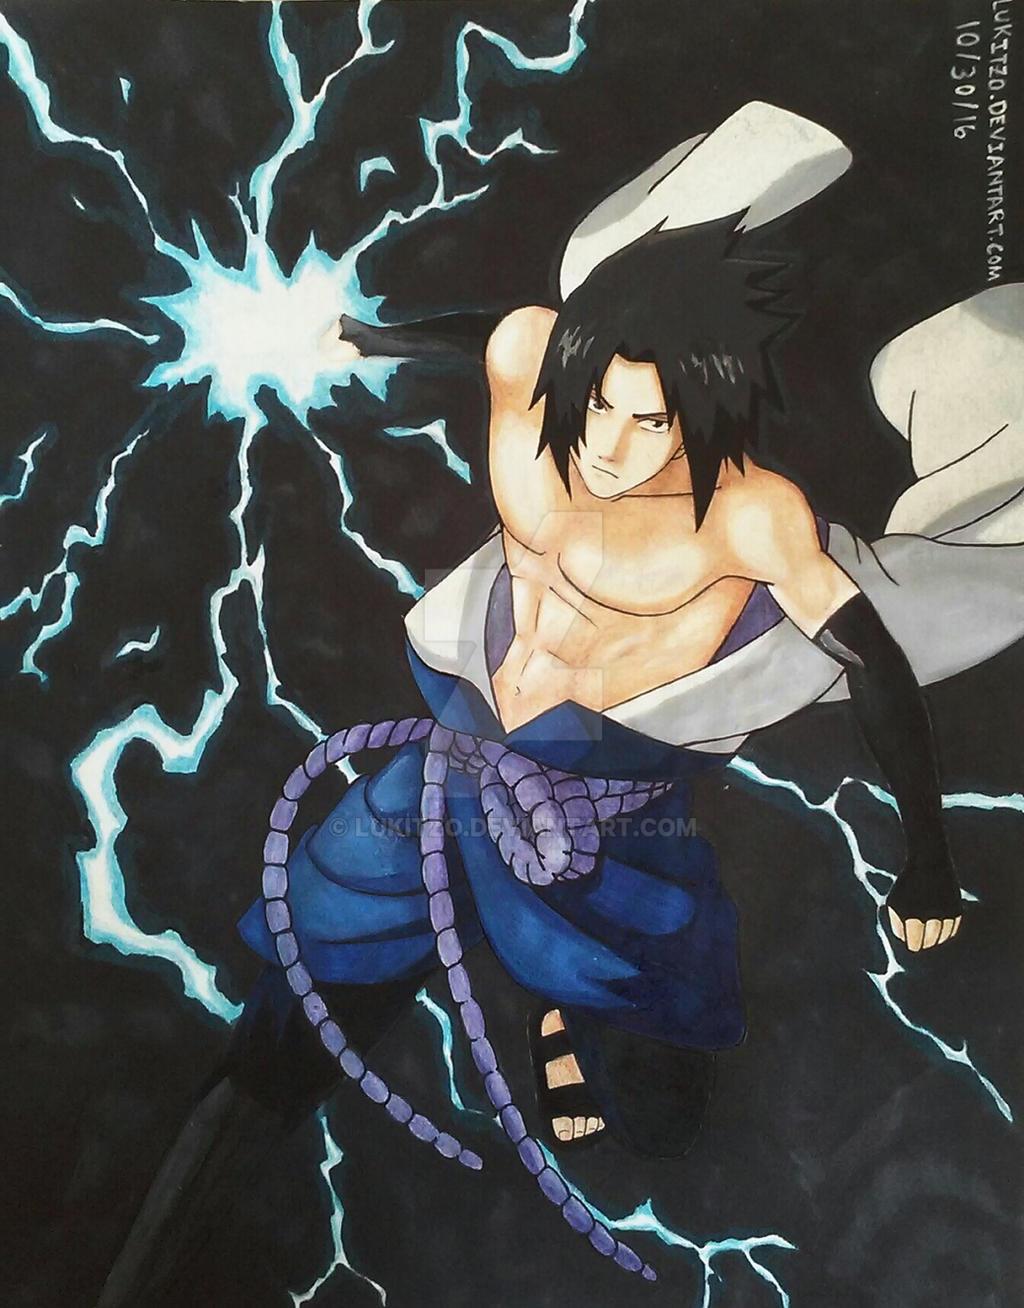 Sasuke's Lightning Blade by Lukitzo on DeviantArt